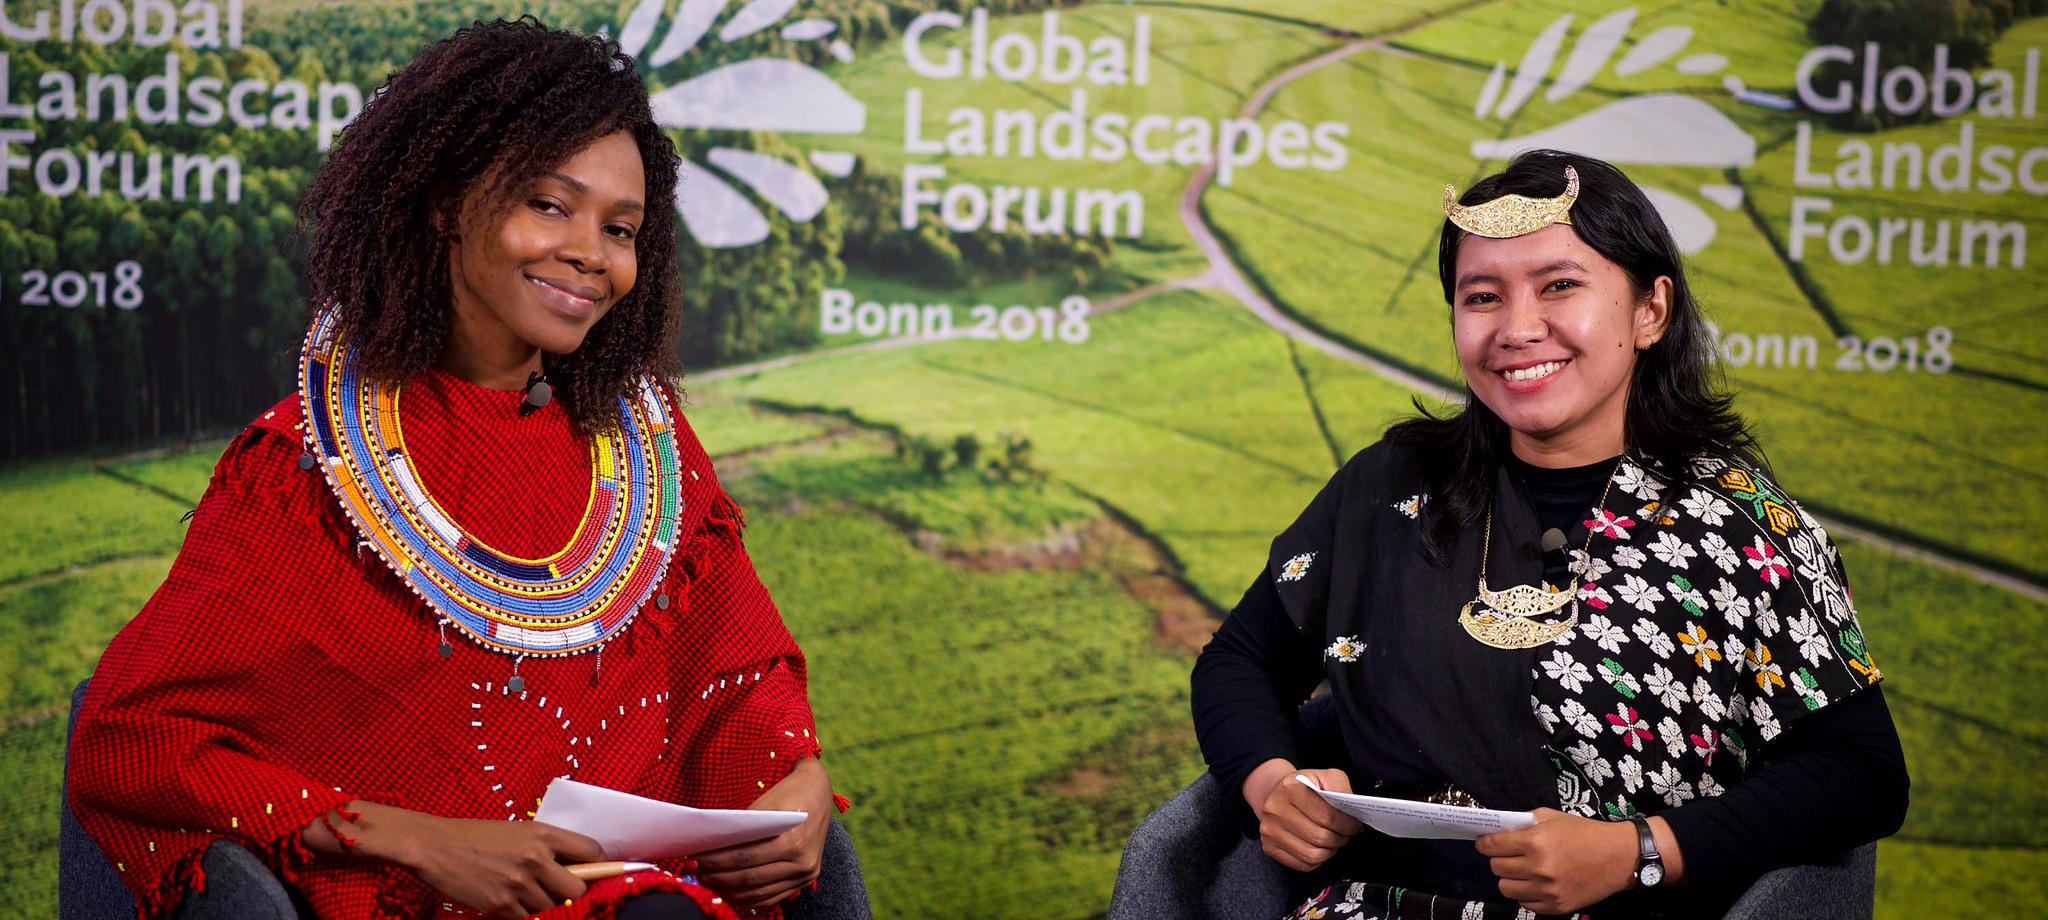 Digital Summits - Global Landscapes Forum Events